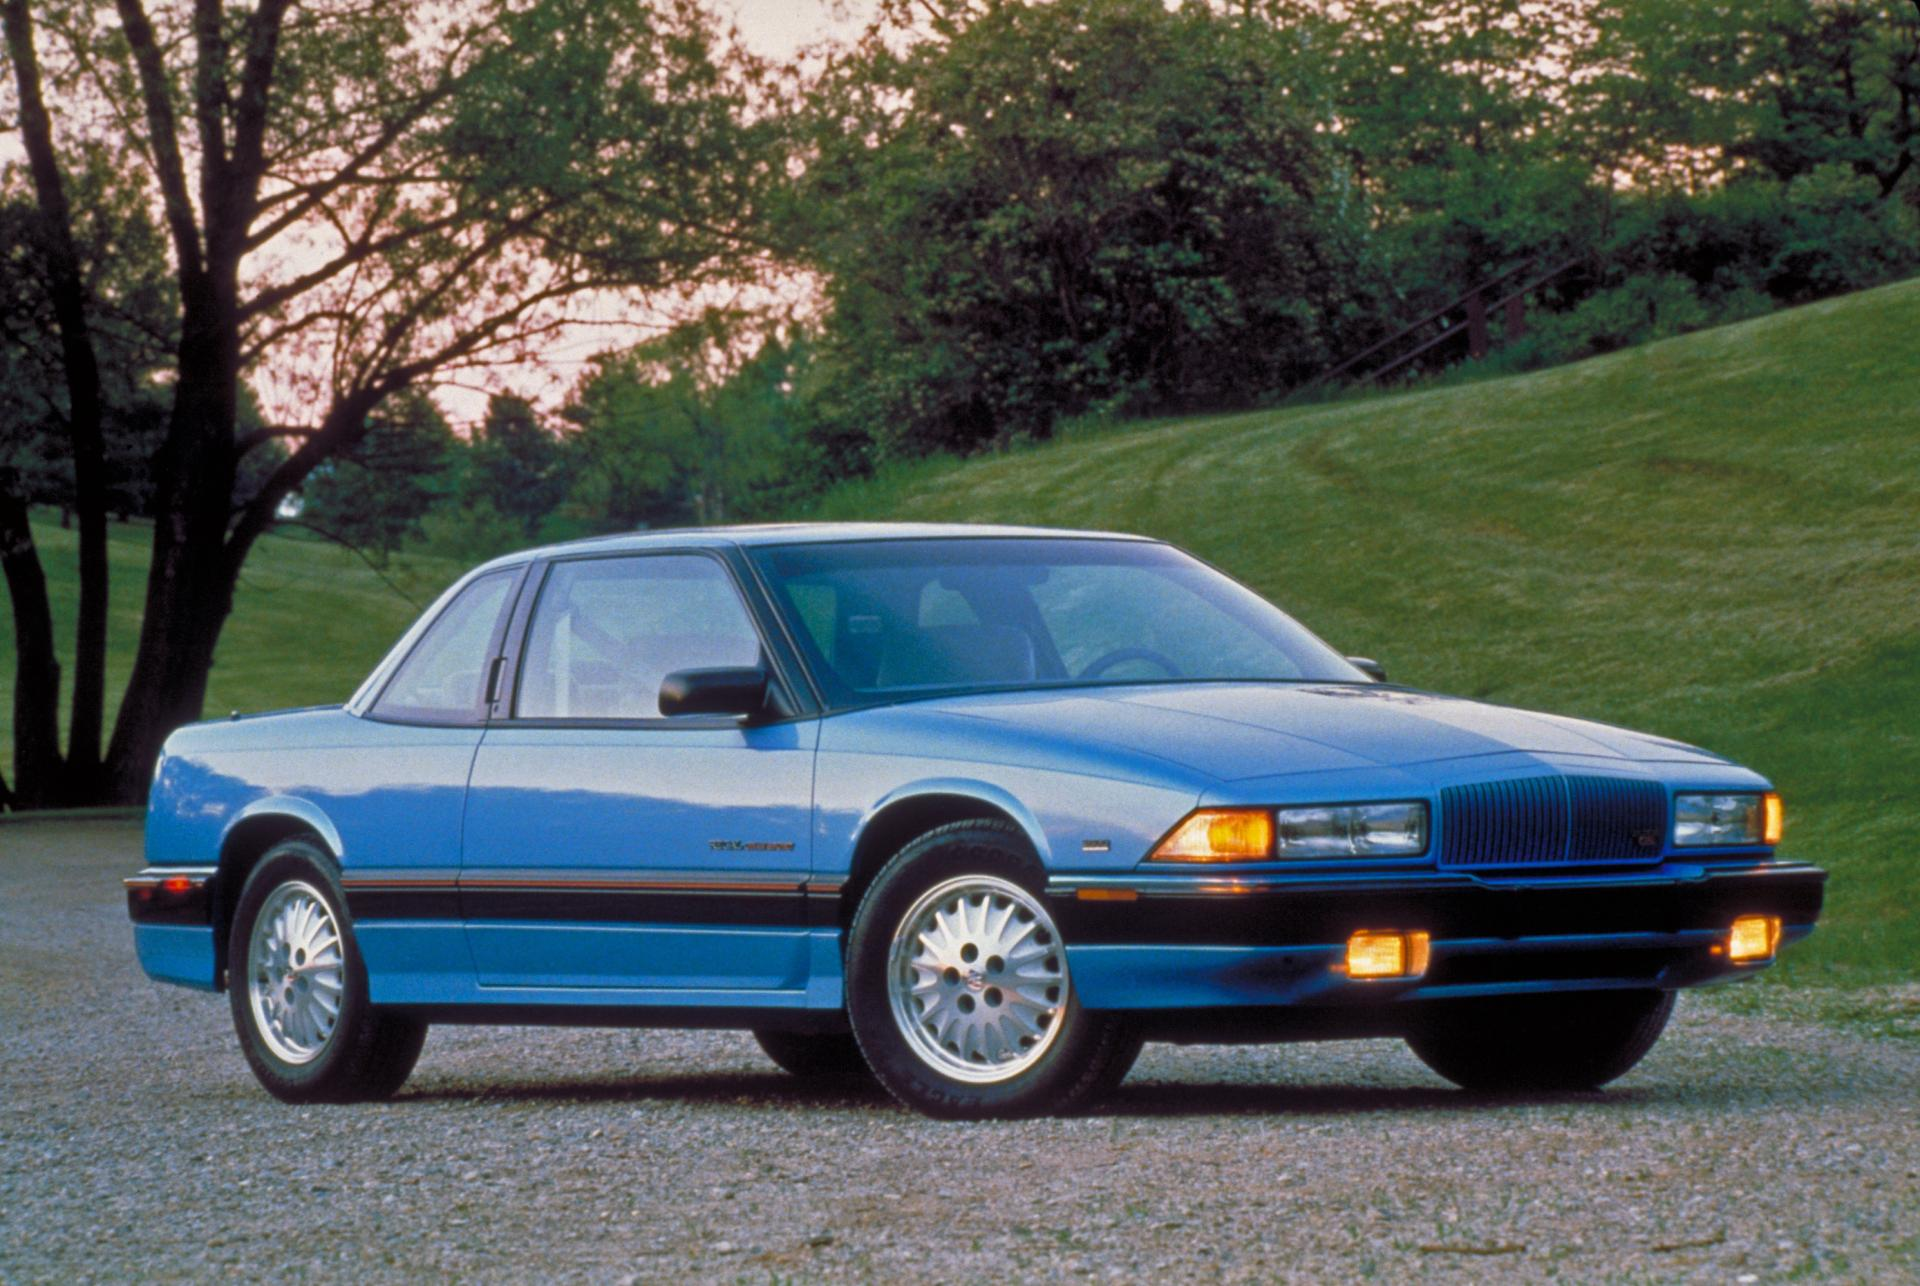 Buick Regal III 1988 - 1996 Coupe #5